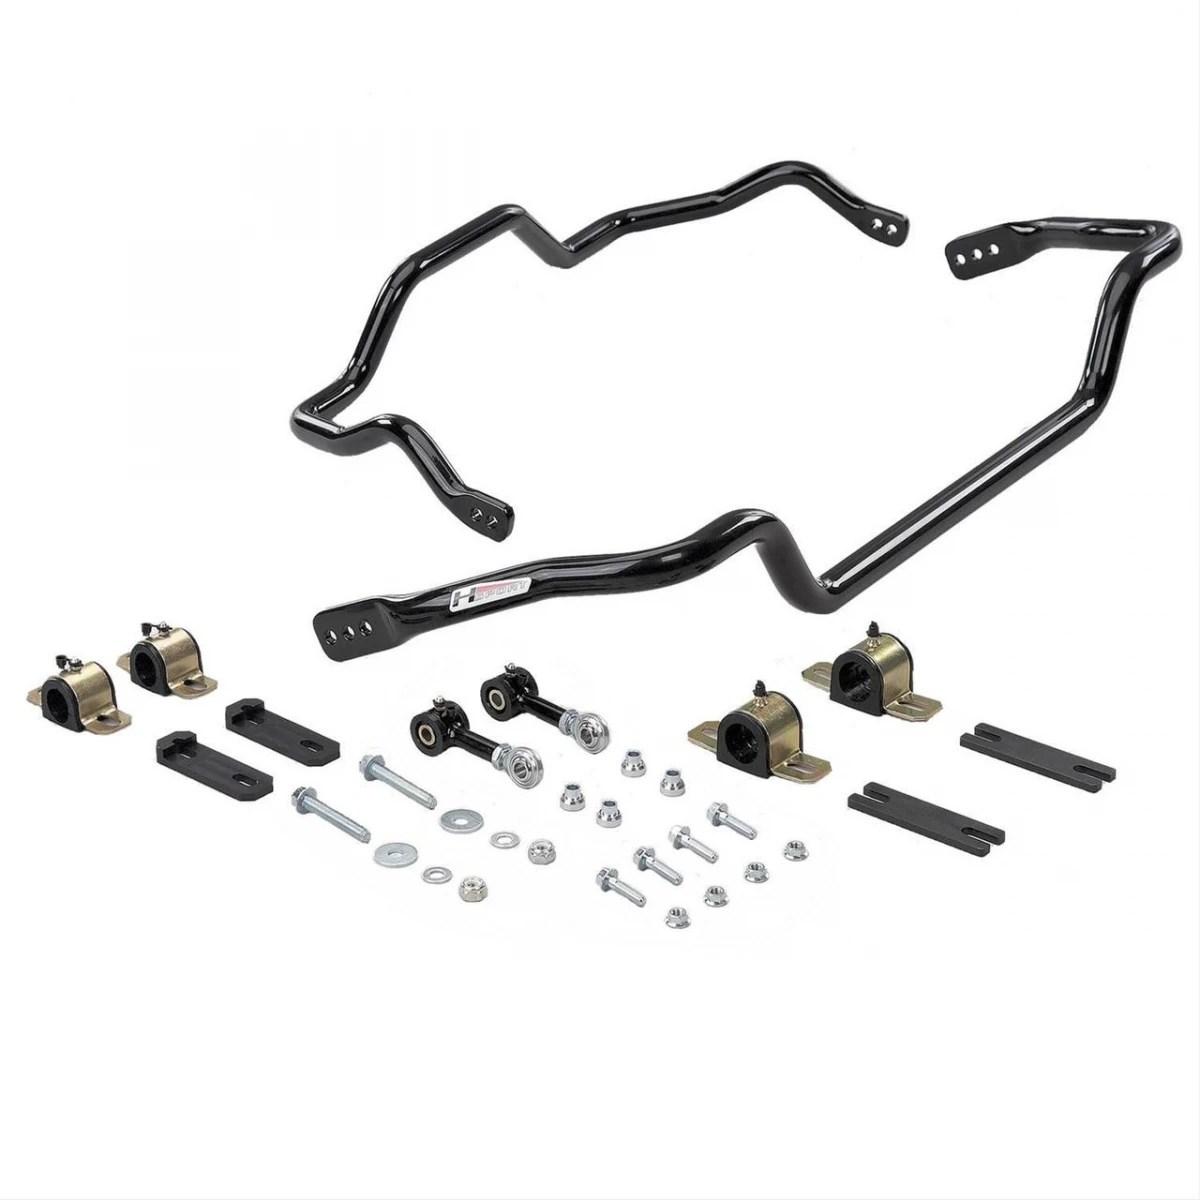 Hotchkis Sport Sway Bar Set For Bmw M3 E46